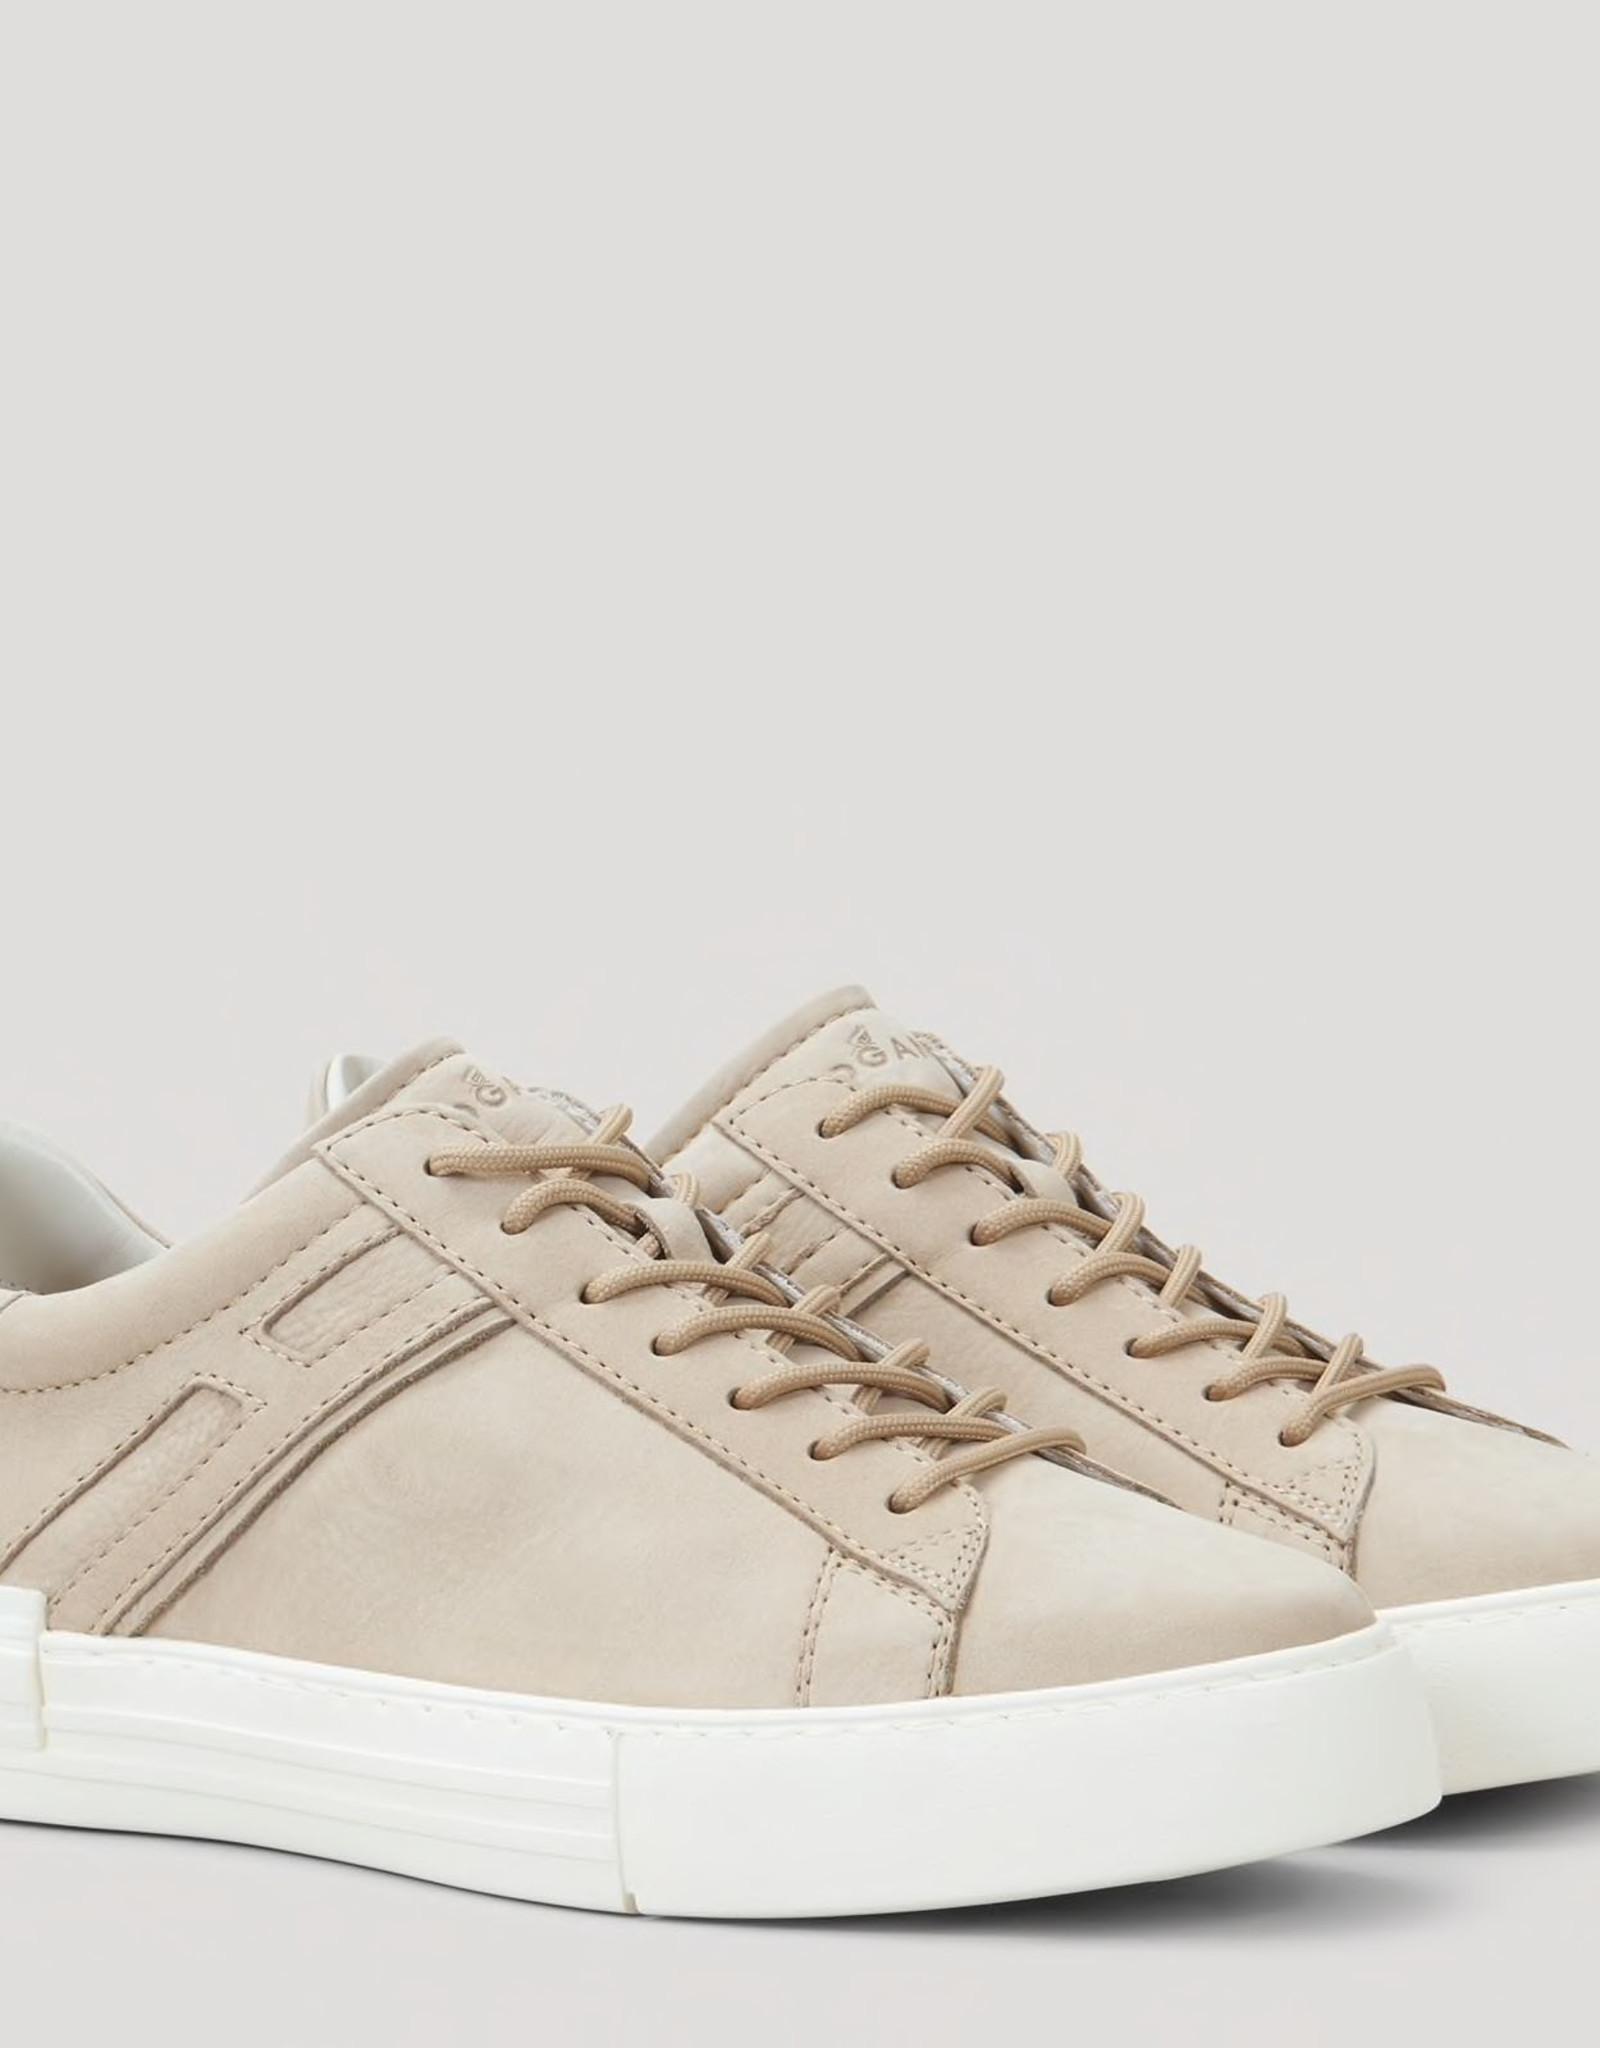 HOGAN Sneakers HXM5260CW006RNC609